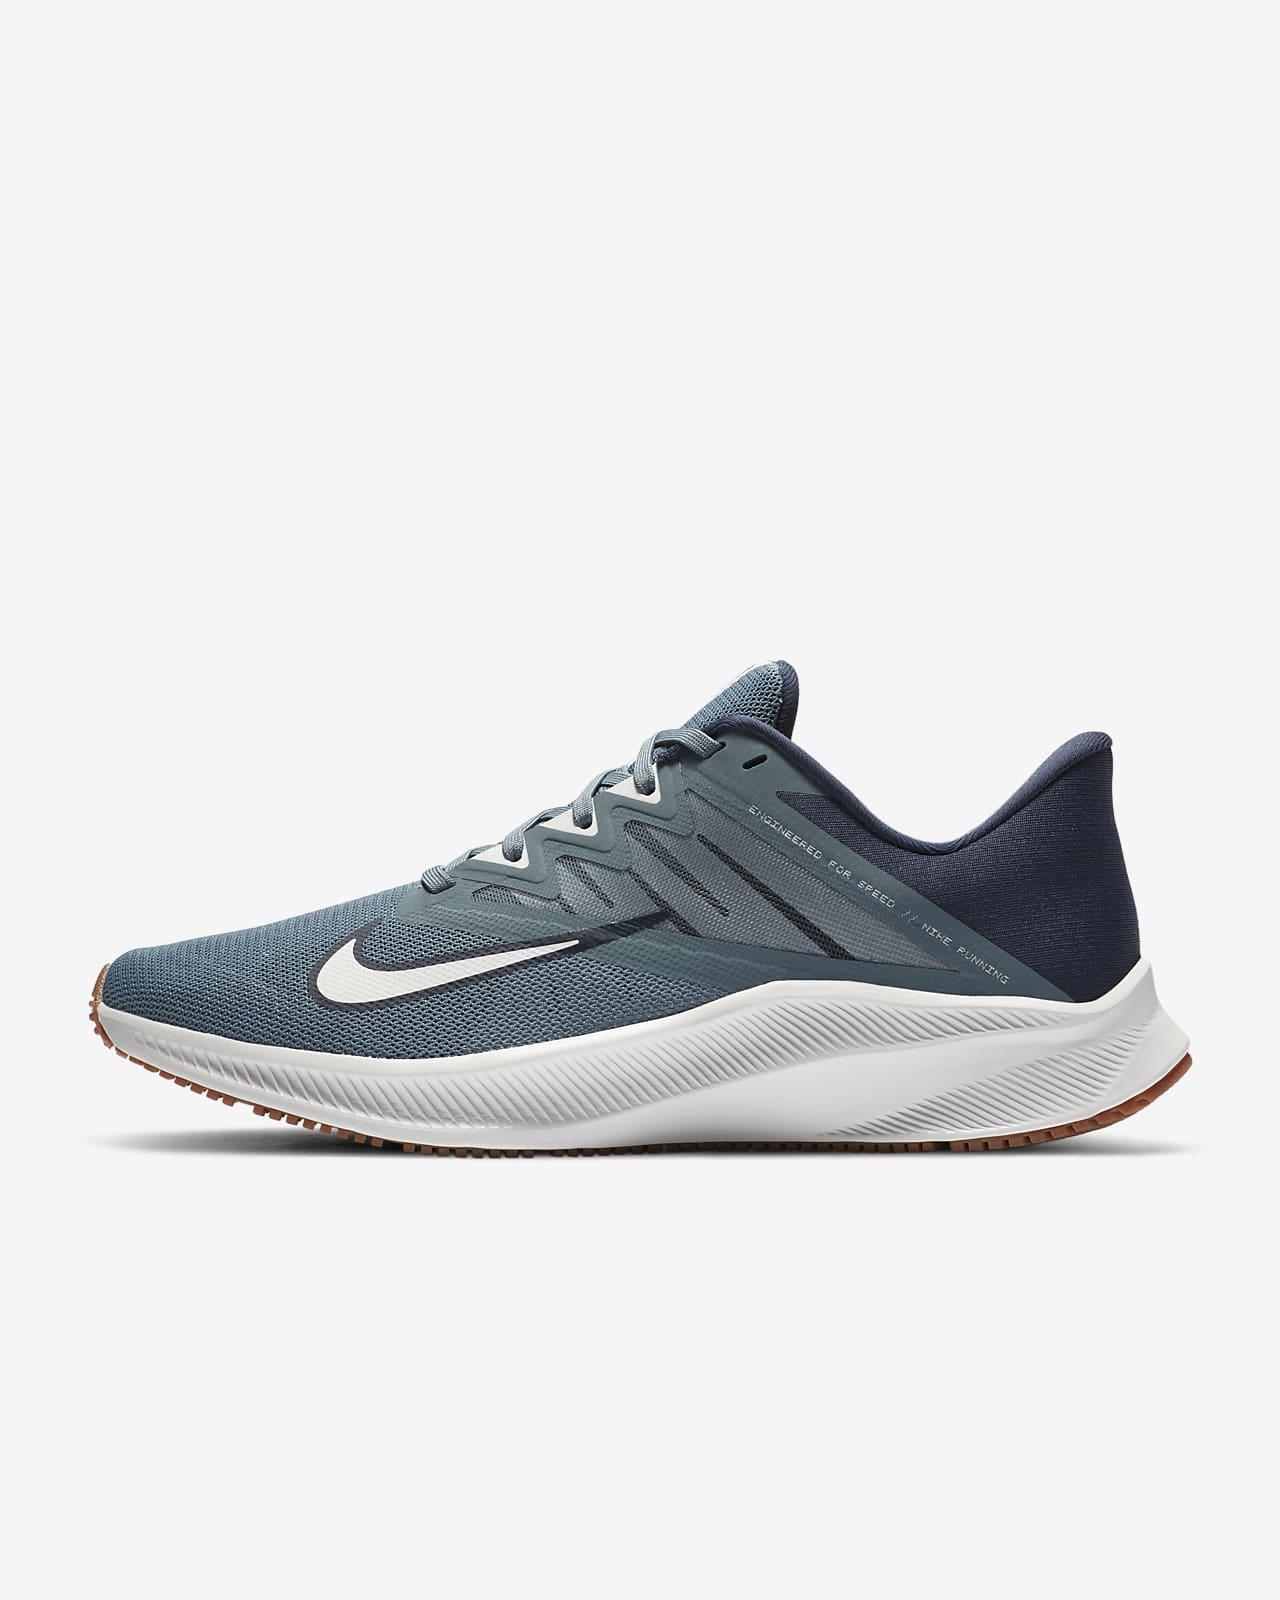 Nike Quest 3 Men's Running Shoe